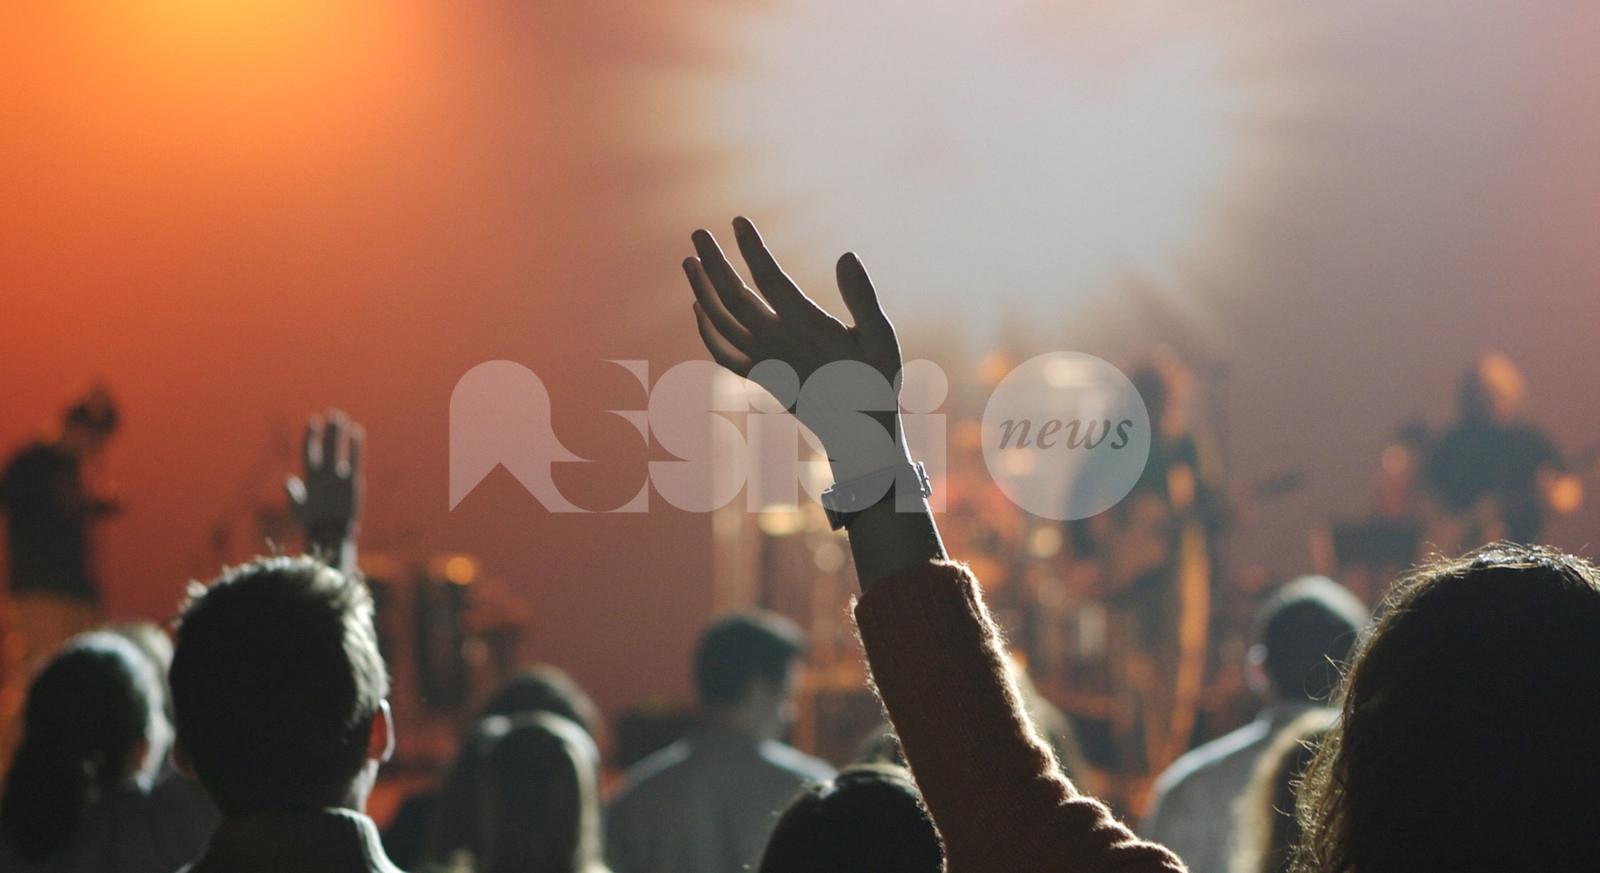 Notte bianca … verde e rossa ad Assisi, organizzano i gruppi social